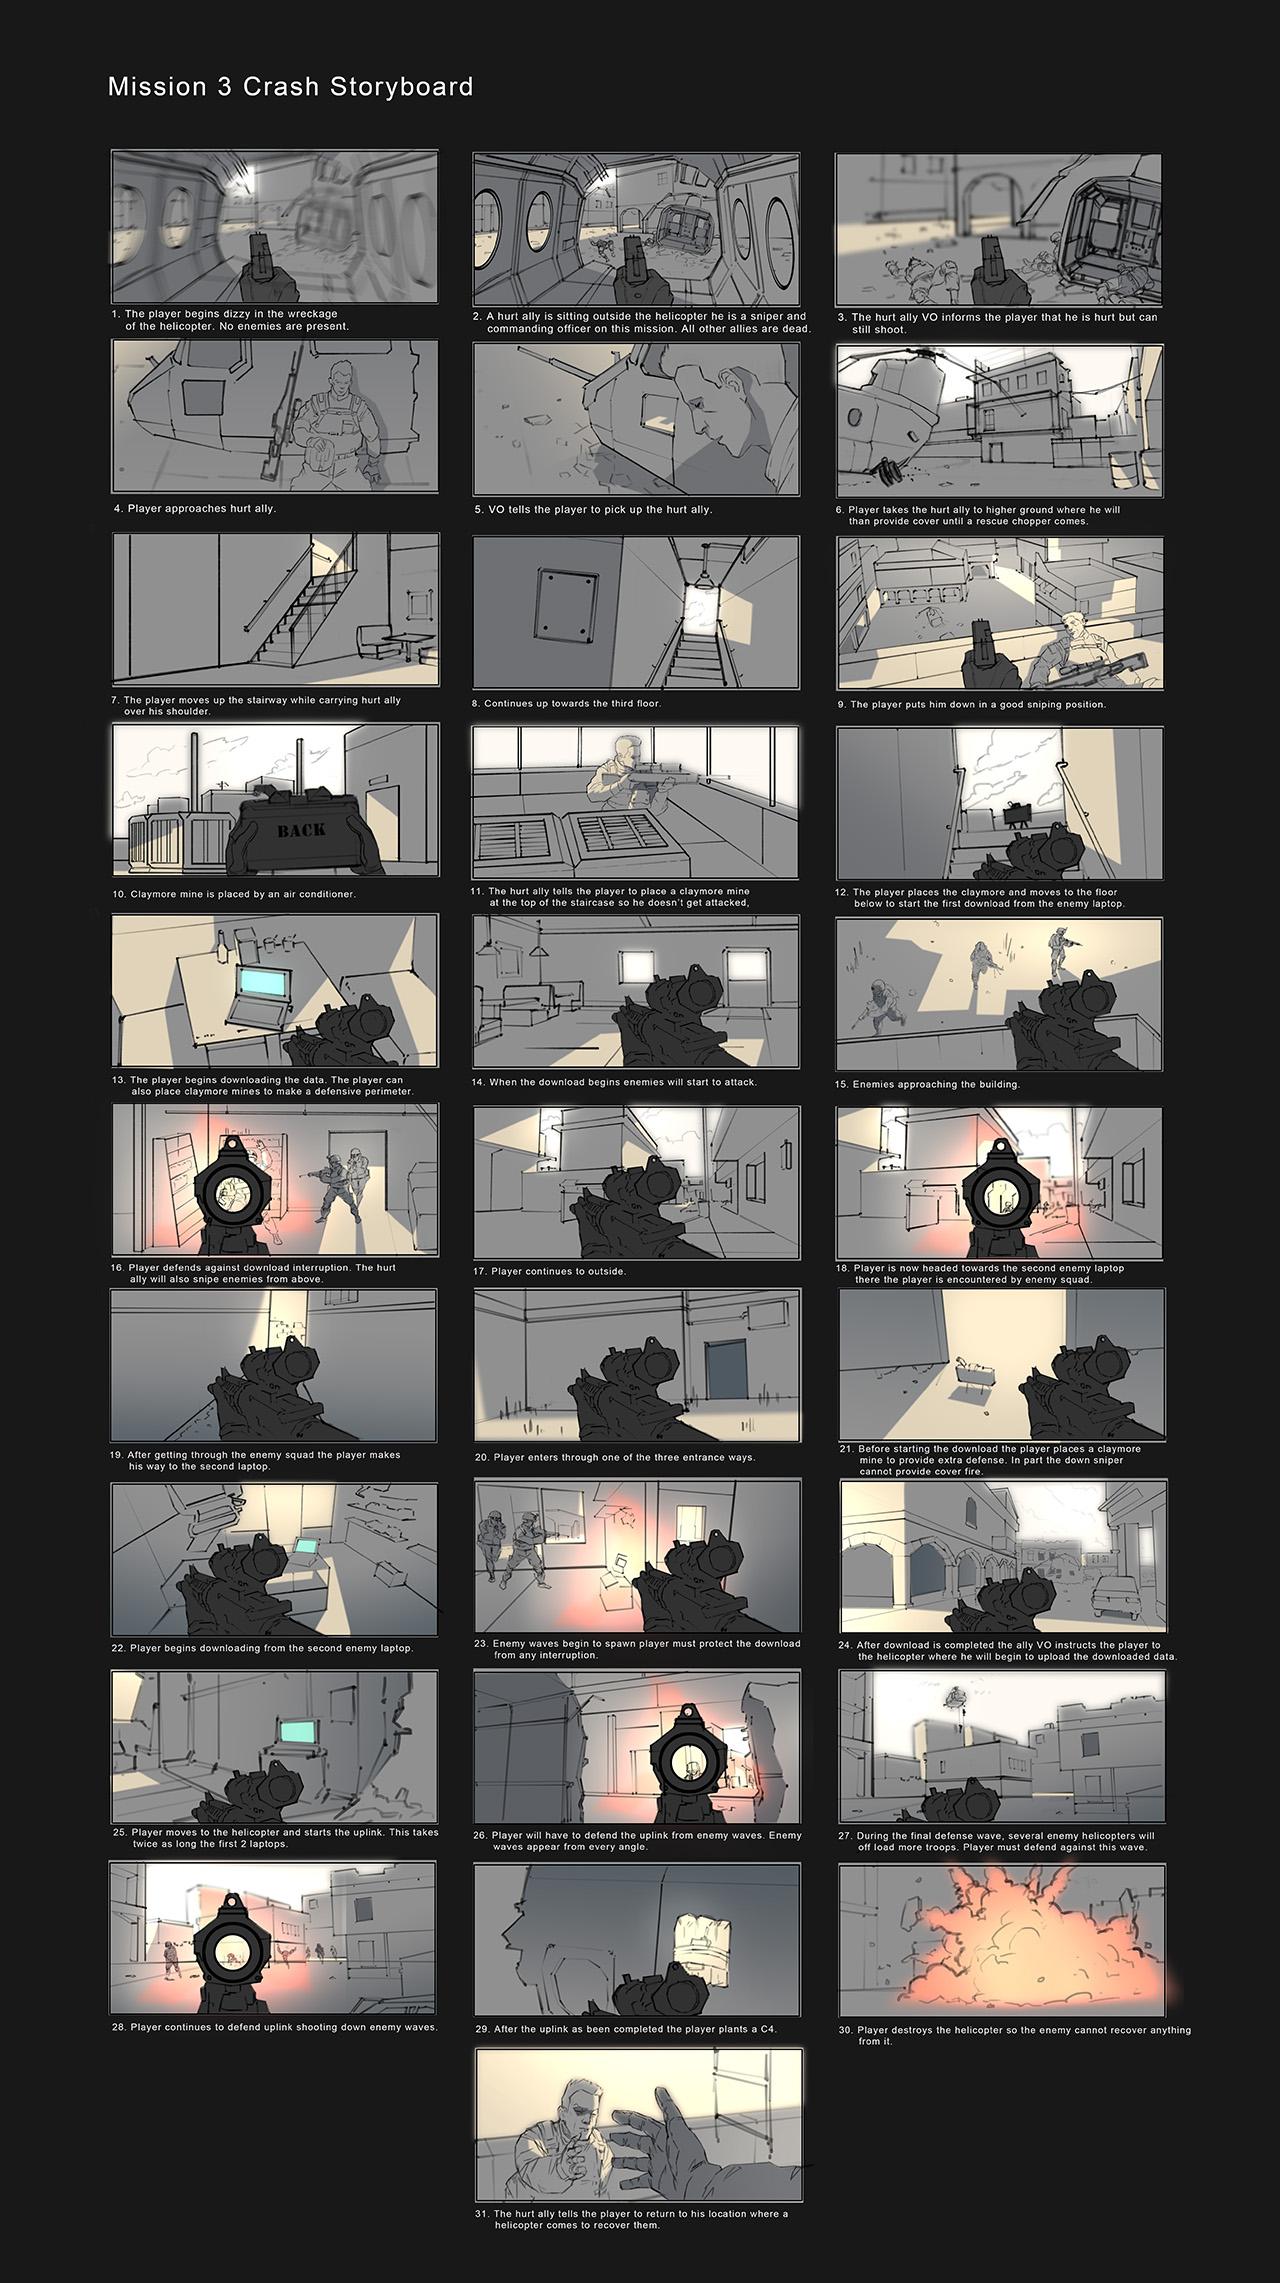 Crash_Storyboard.jpg